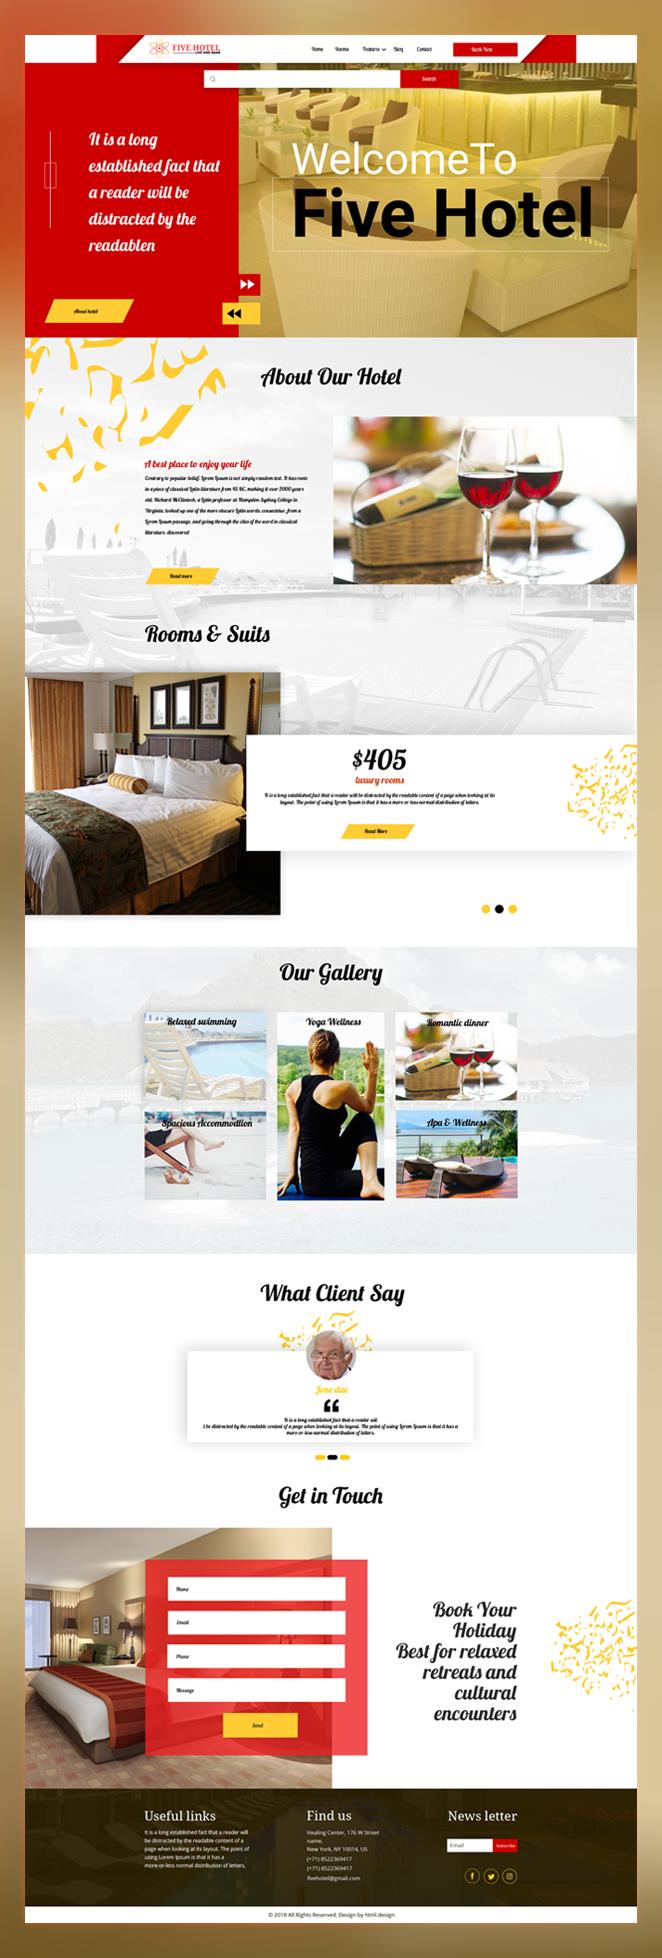 Five hotel psd template